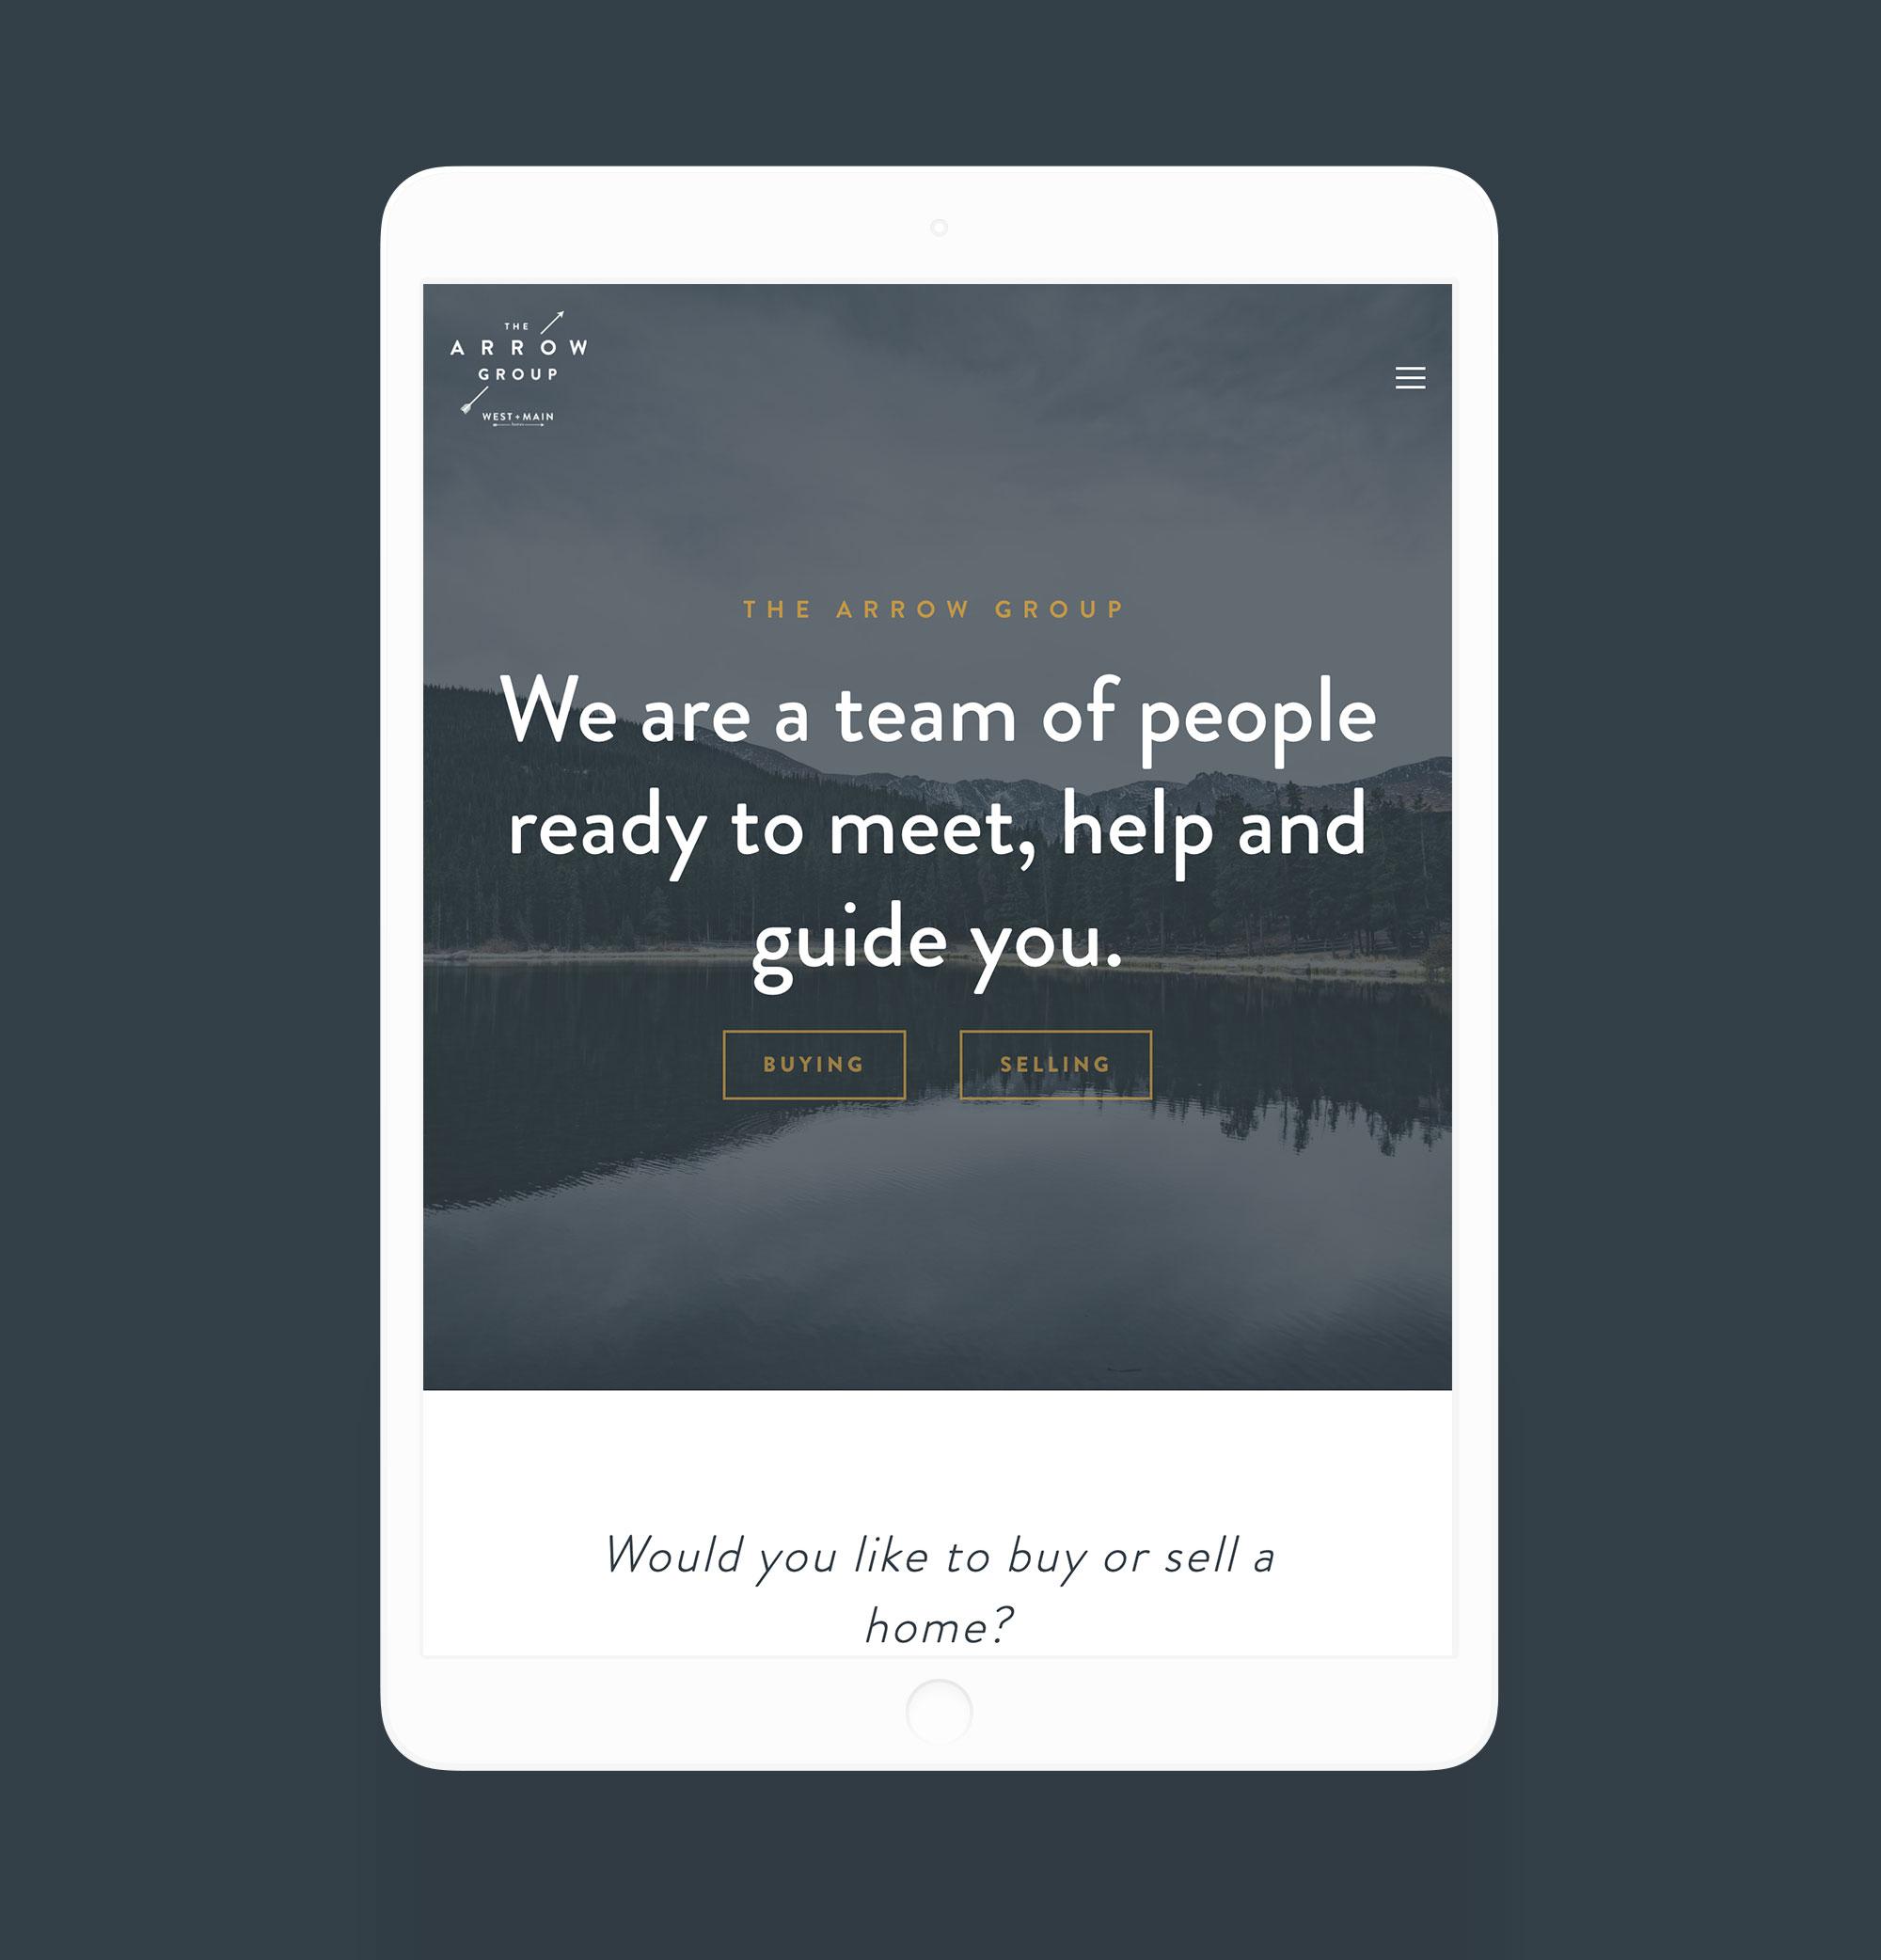 arrow-group-web-iPad-home.jpg